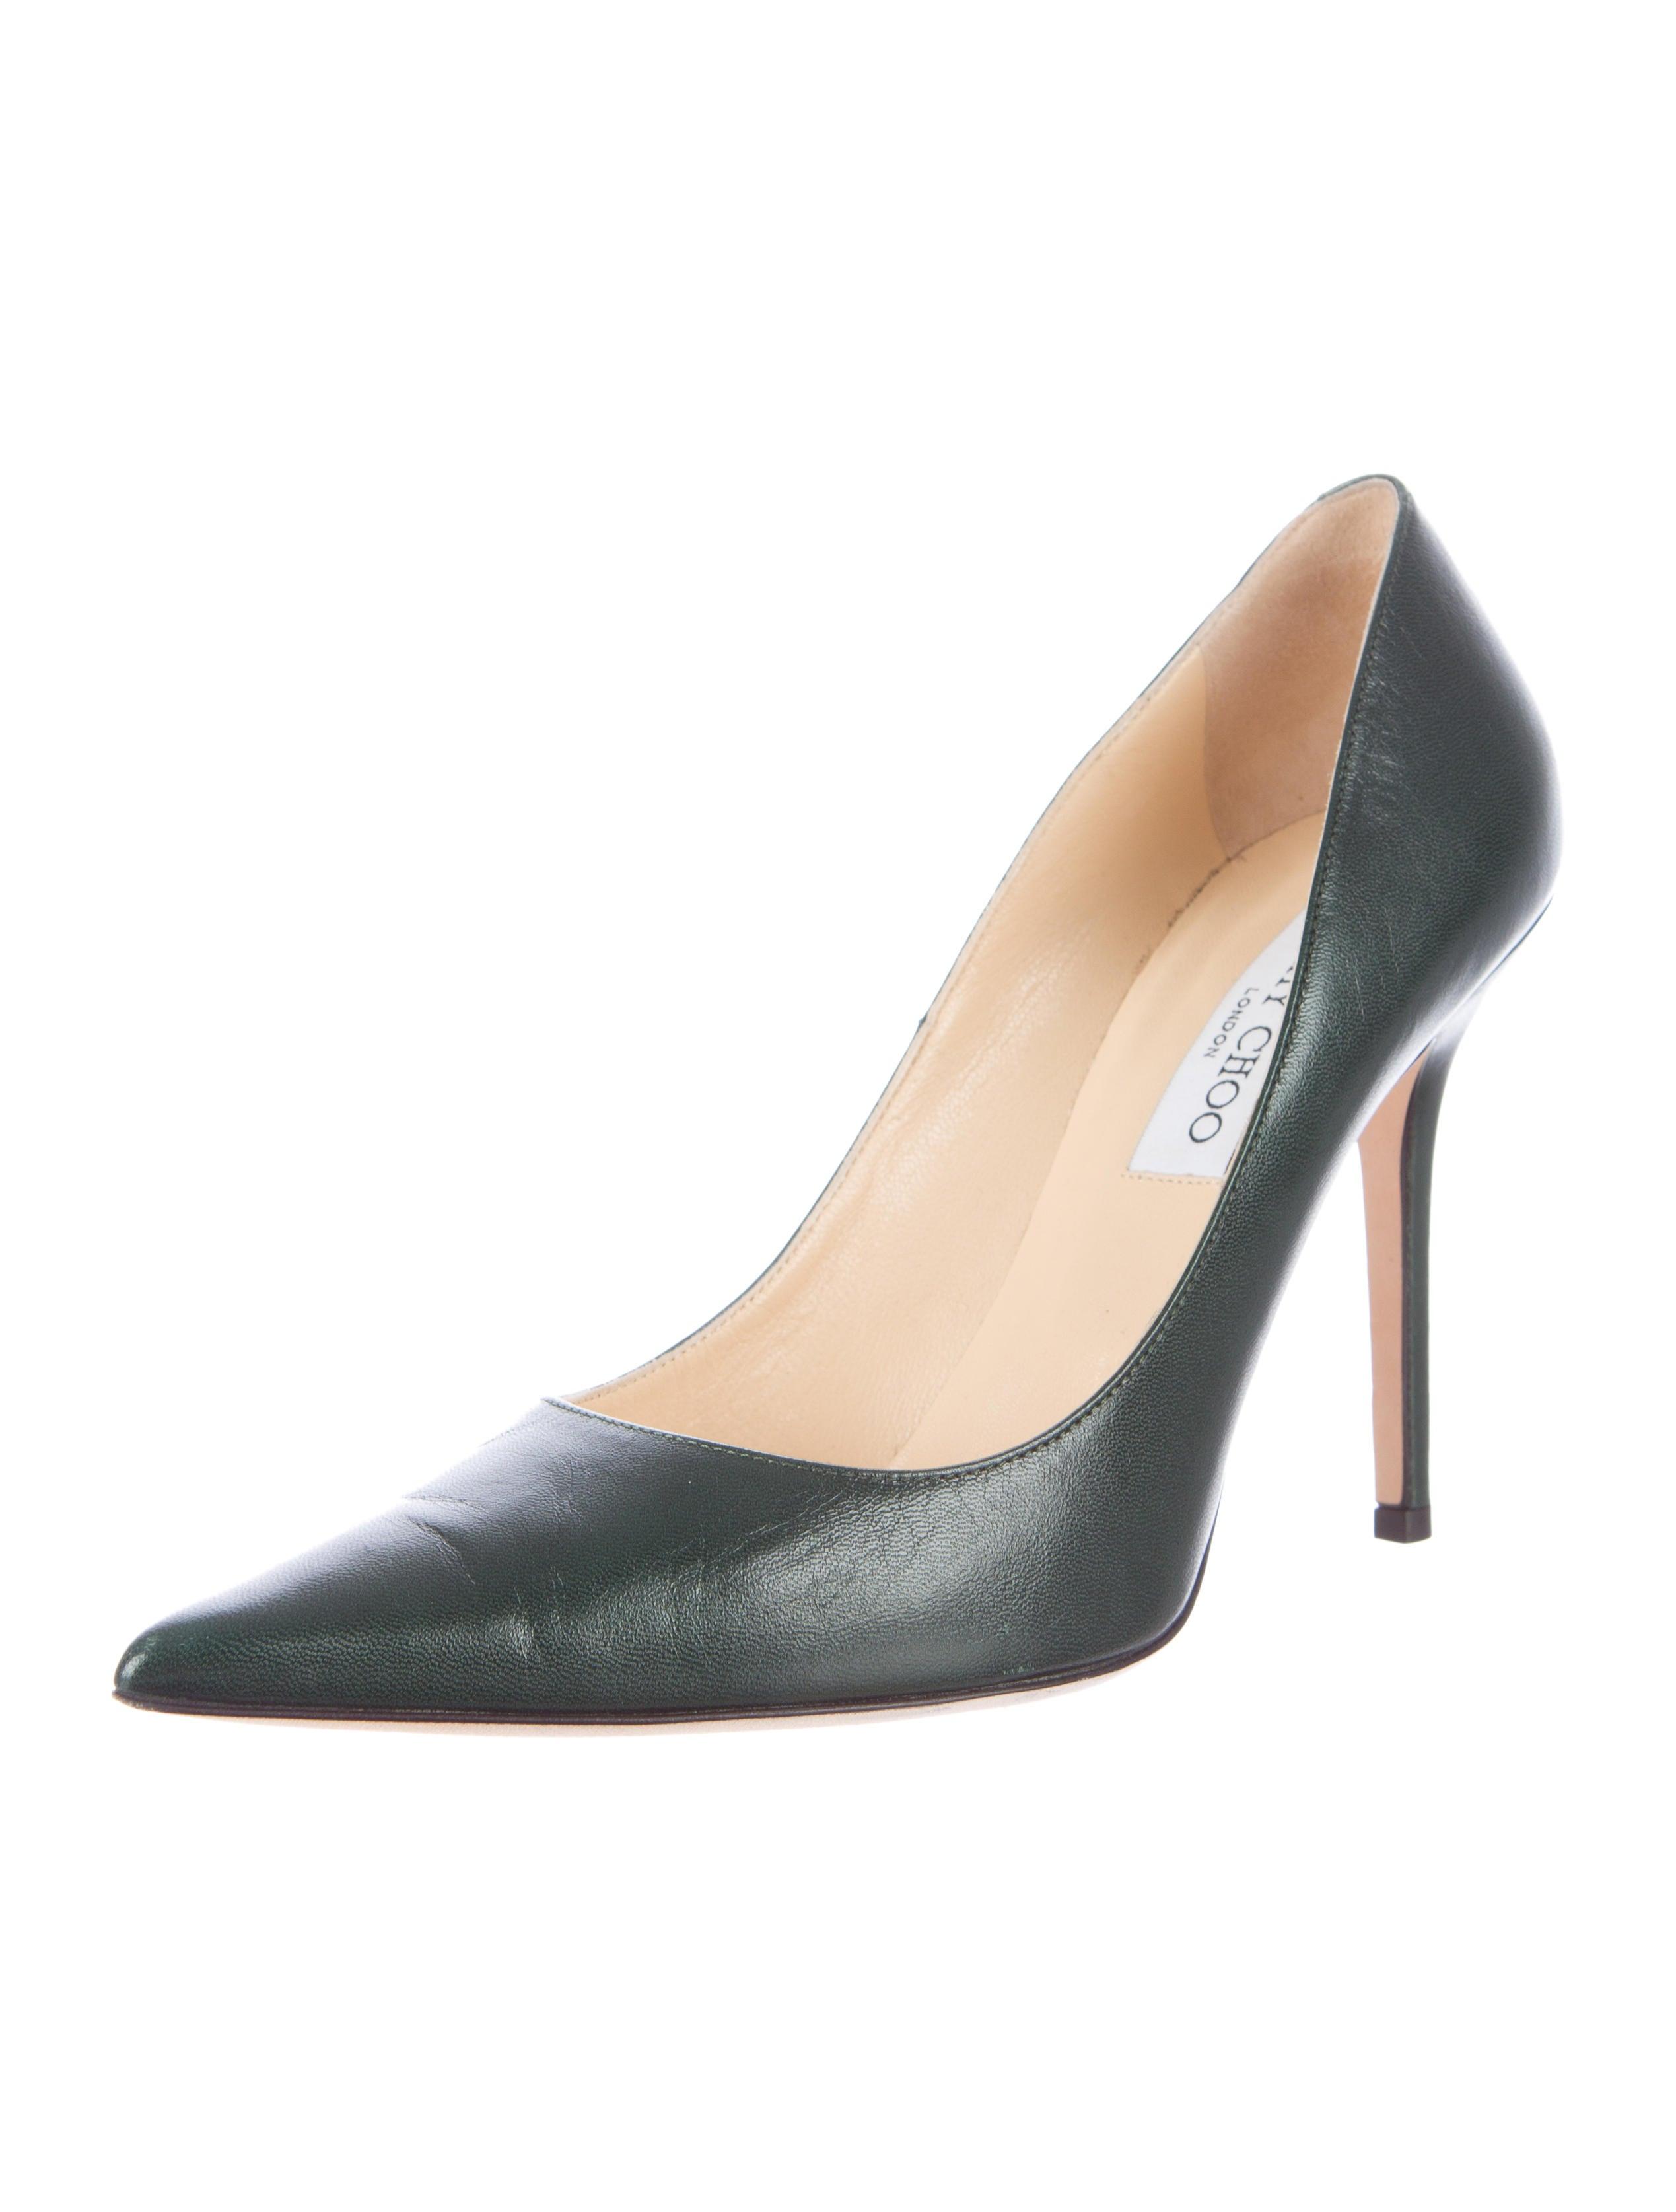 jimmy choo pumps shoes jim37242 the realreal